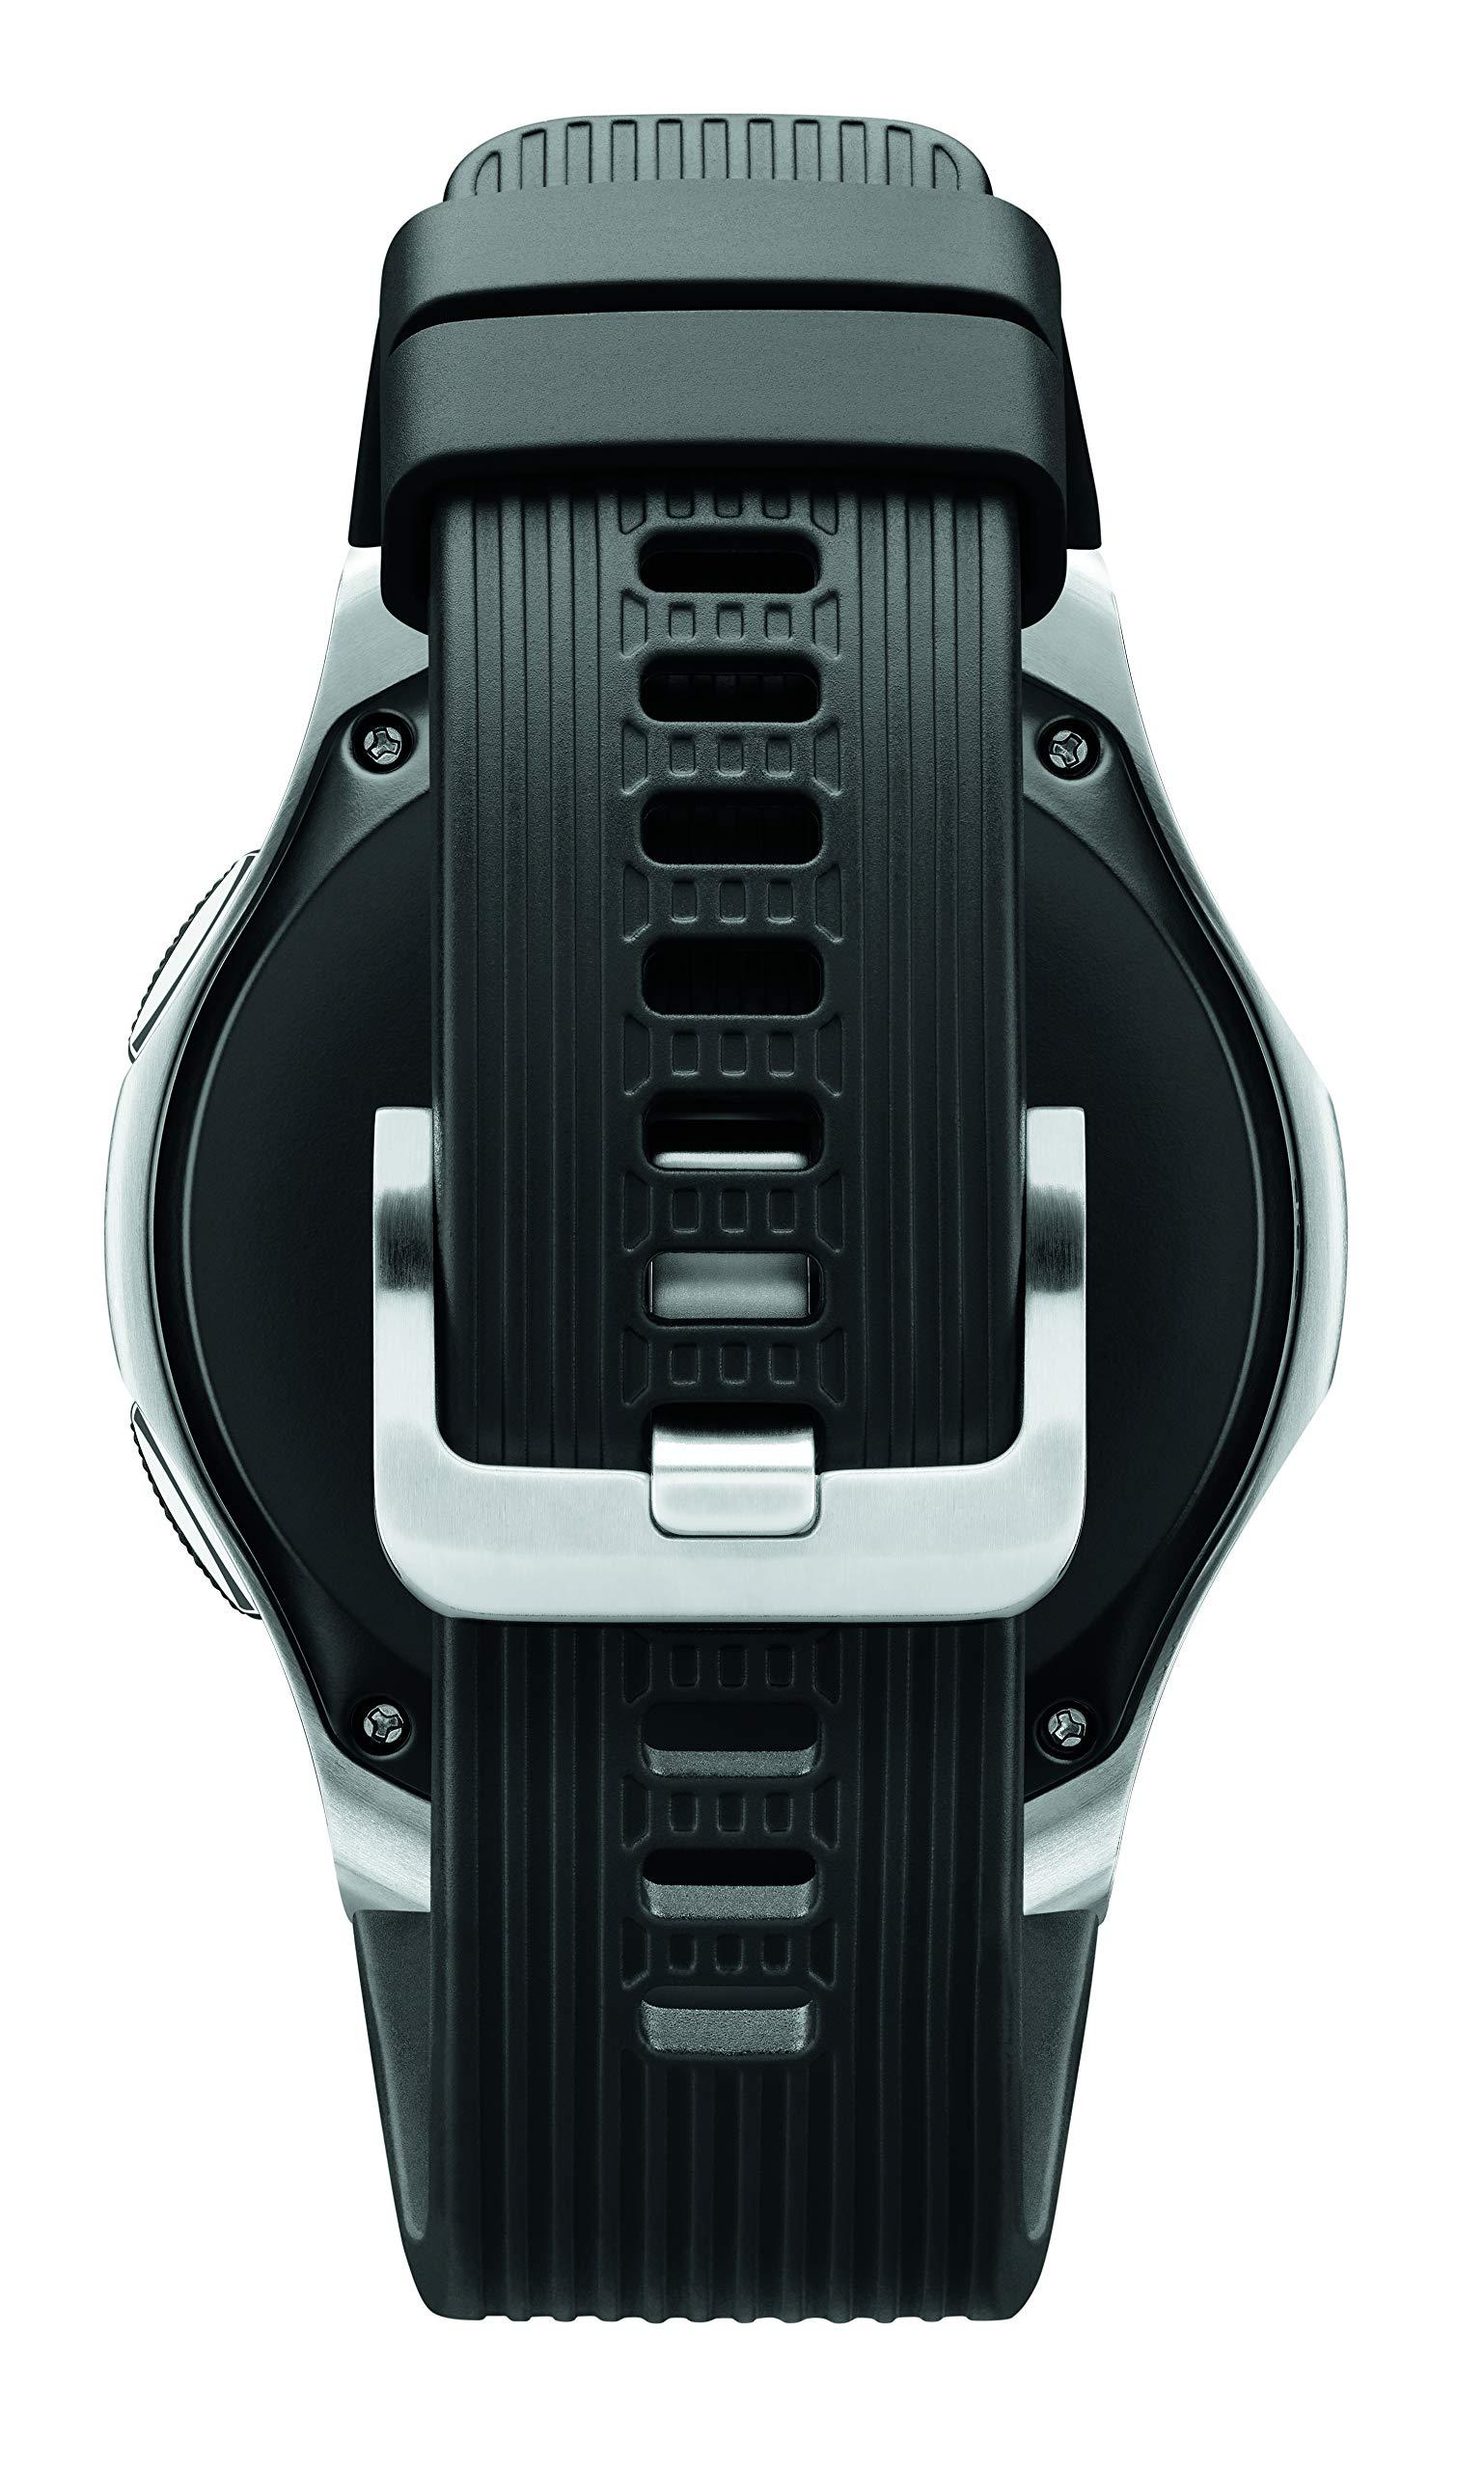 Samsung Galaxy Smartwatch (46mm) Silver (Bluetooth), SM-R800NZSAXAR - US Version with Warranty by Samsung (Image #4)